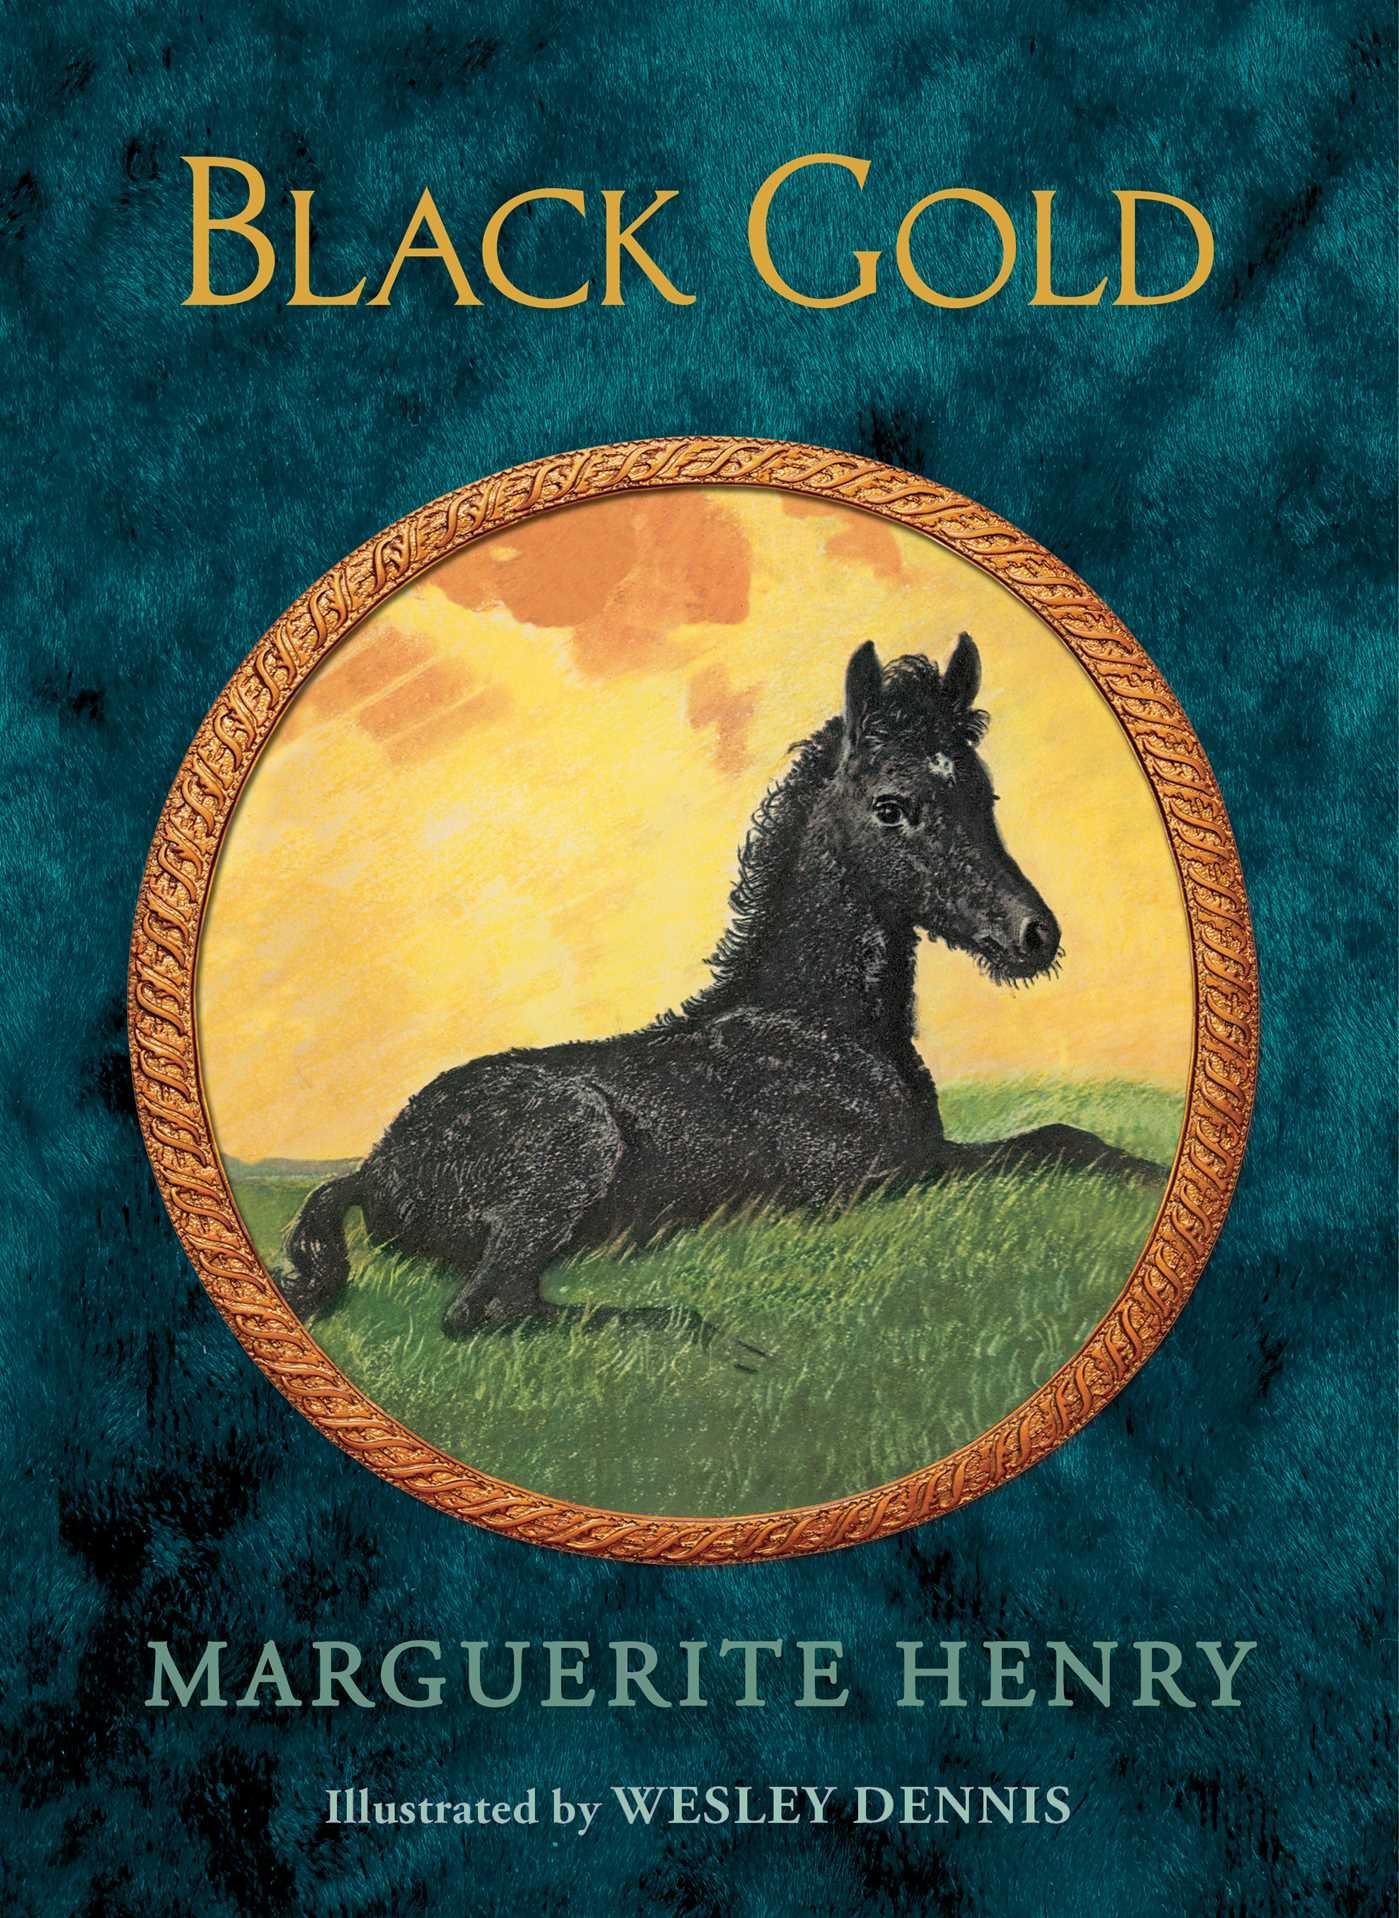 Black gold 9781442488076 hr